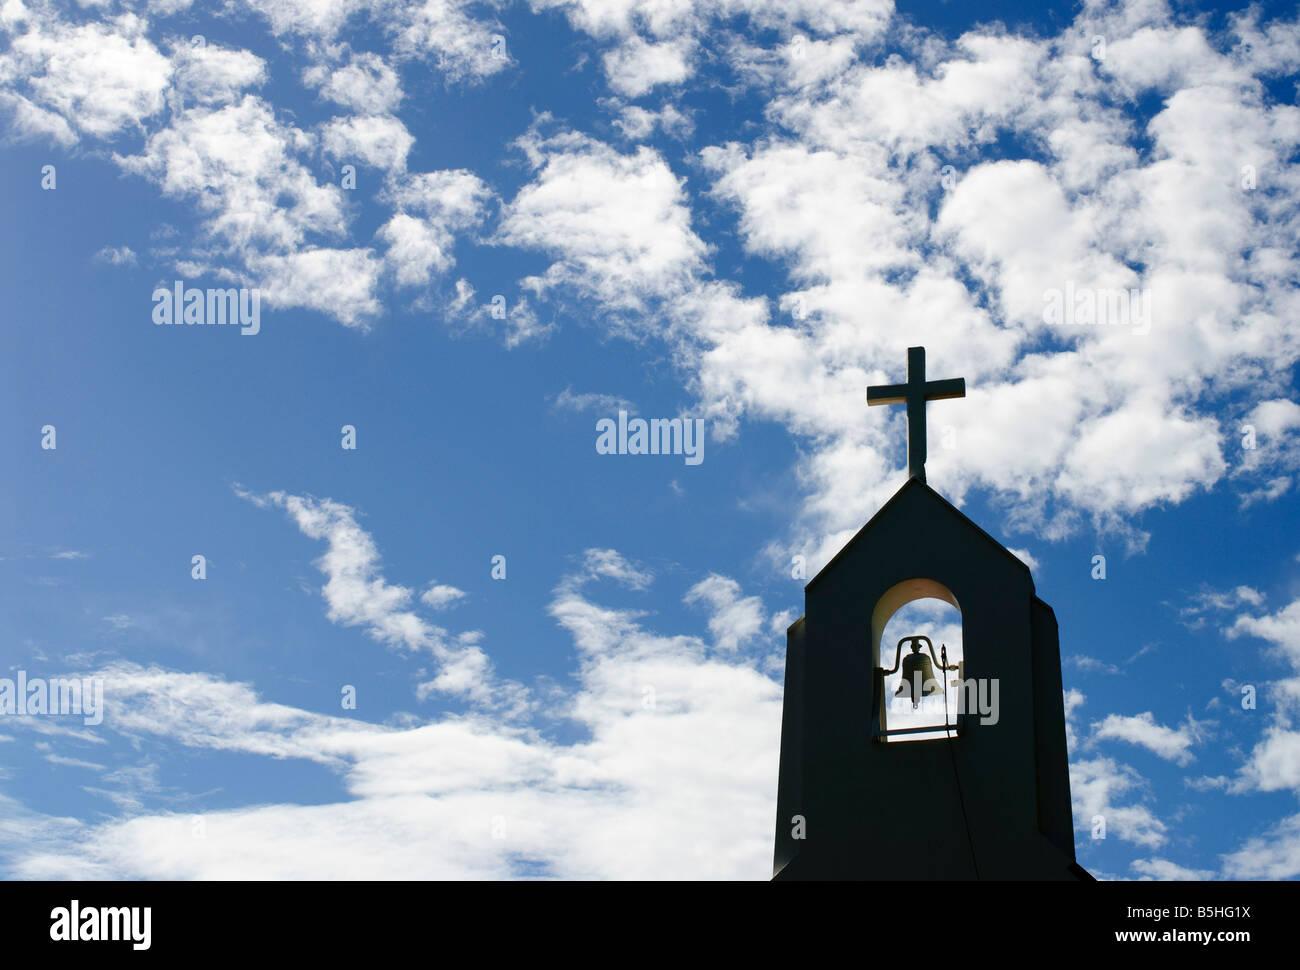 Silhouette Of A Church Steeple On St John In The Us Virgin Islands